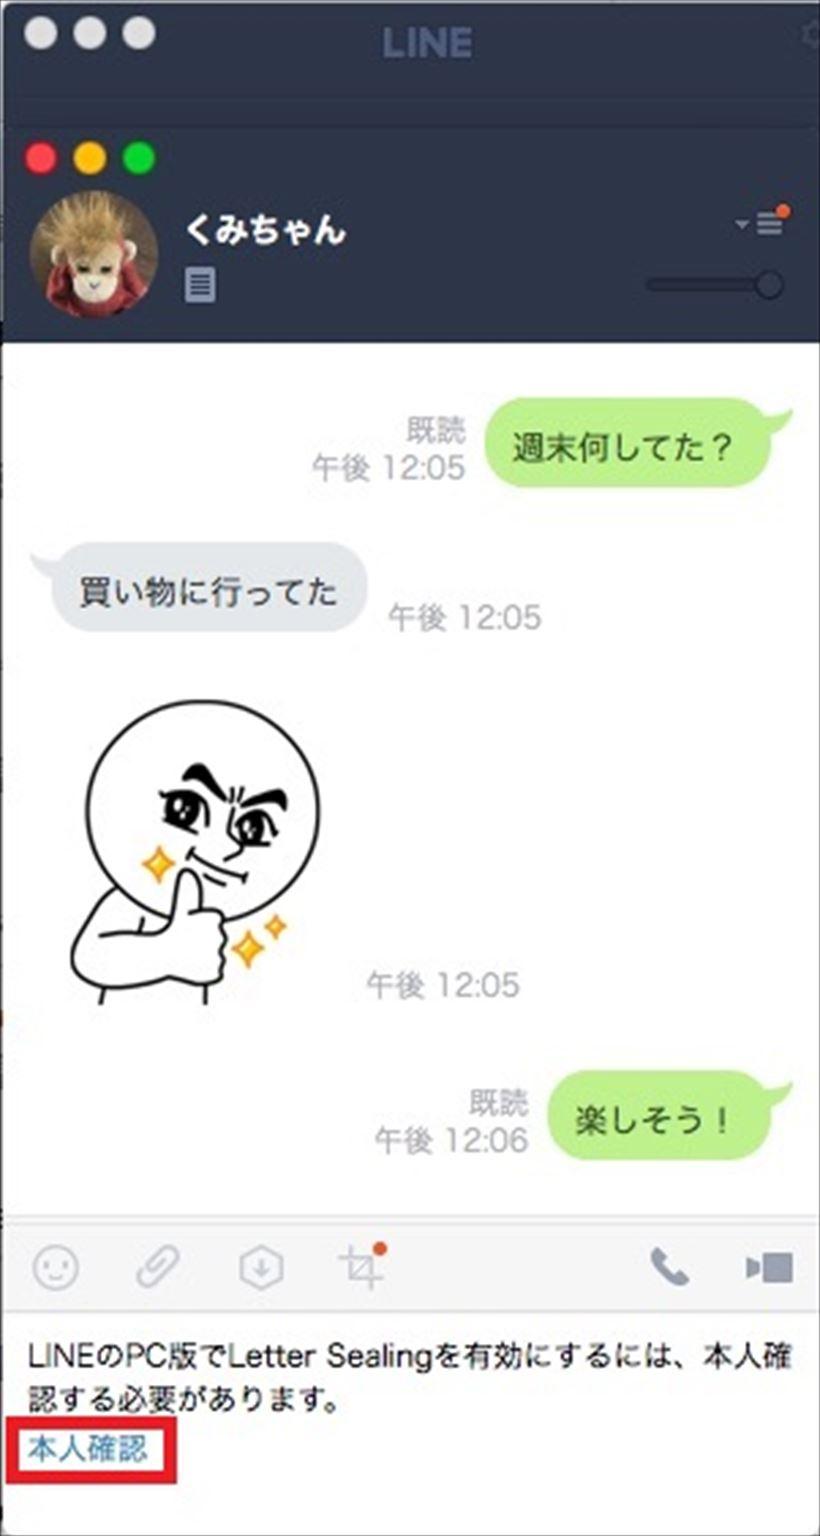 20161125_y-koba_LINE_007_R